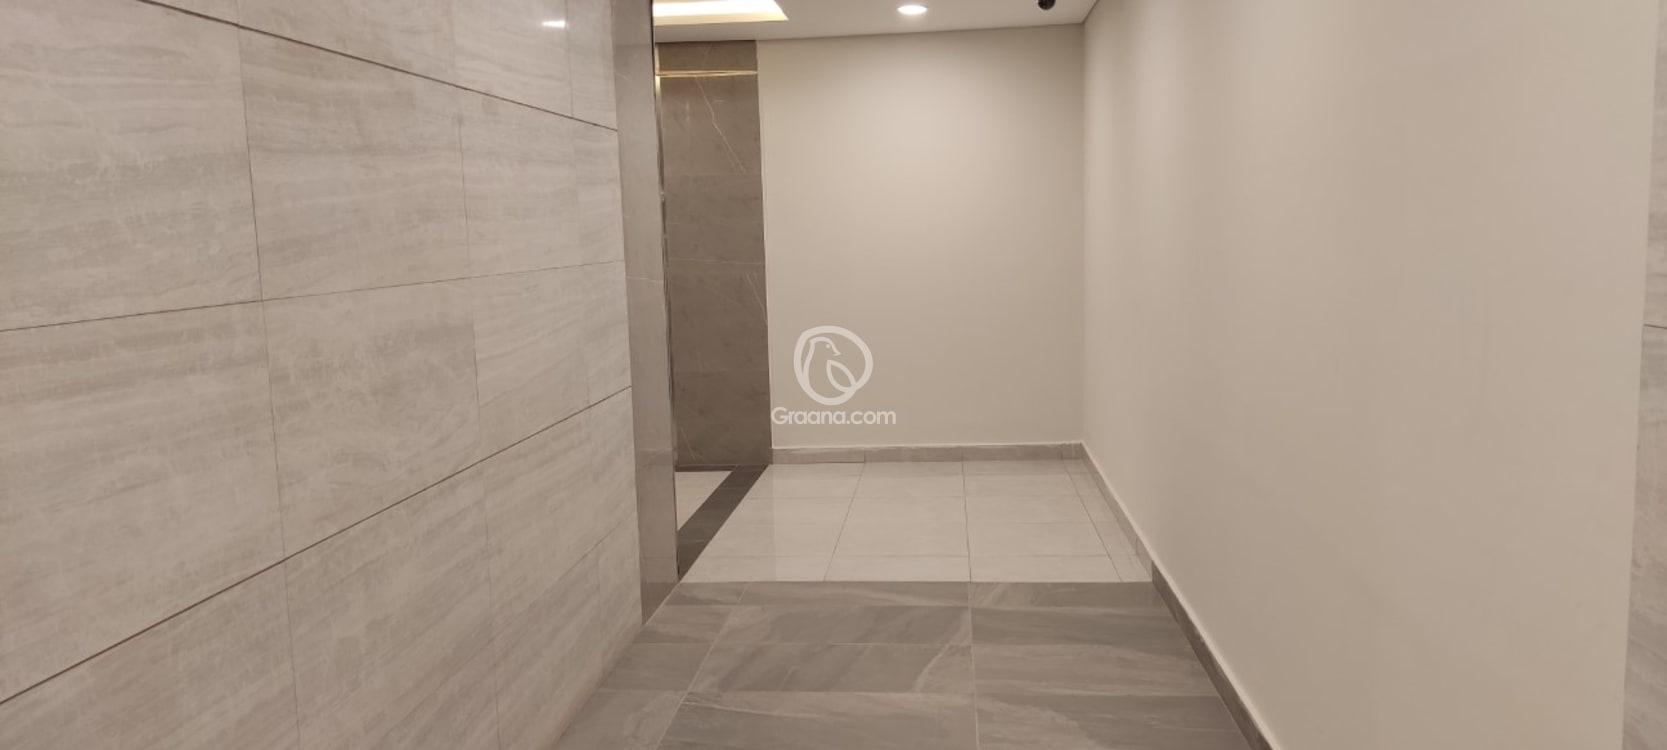 2632 Sqft Apartment for Sale | Graana.com